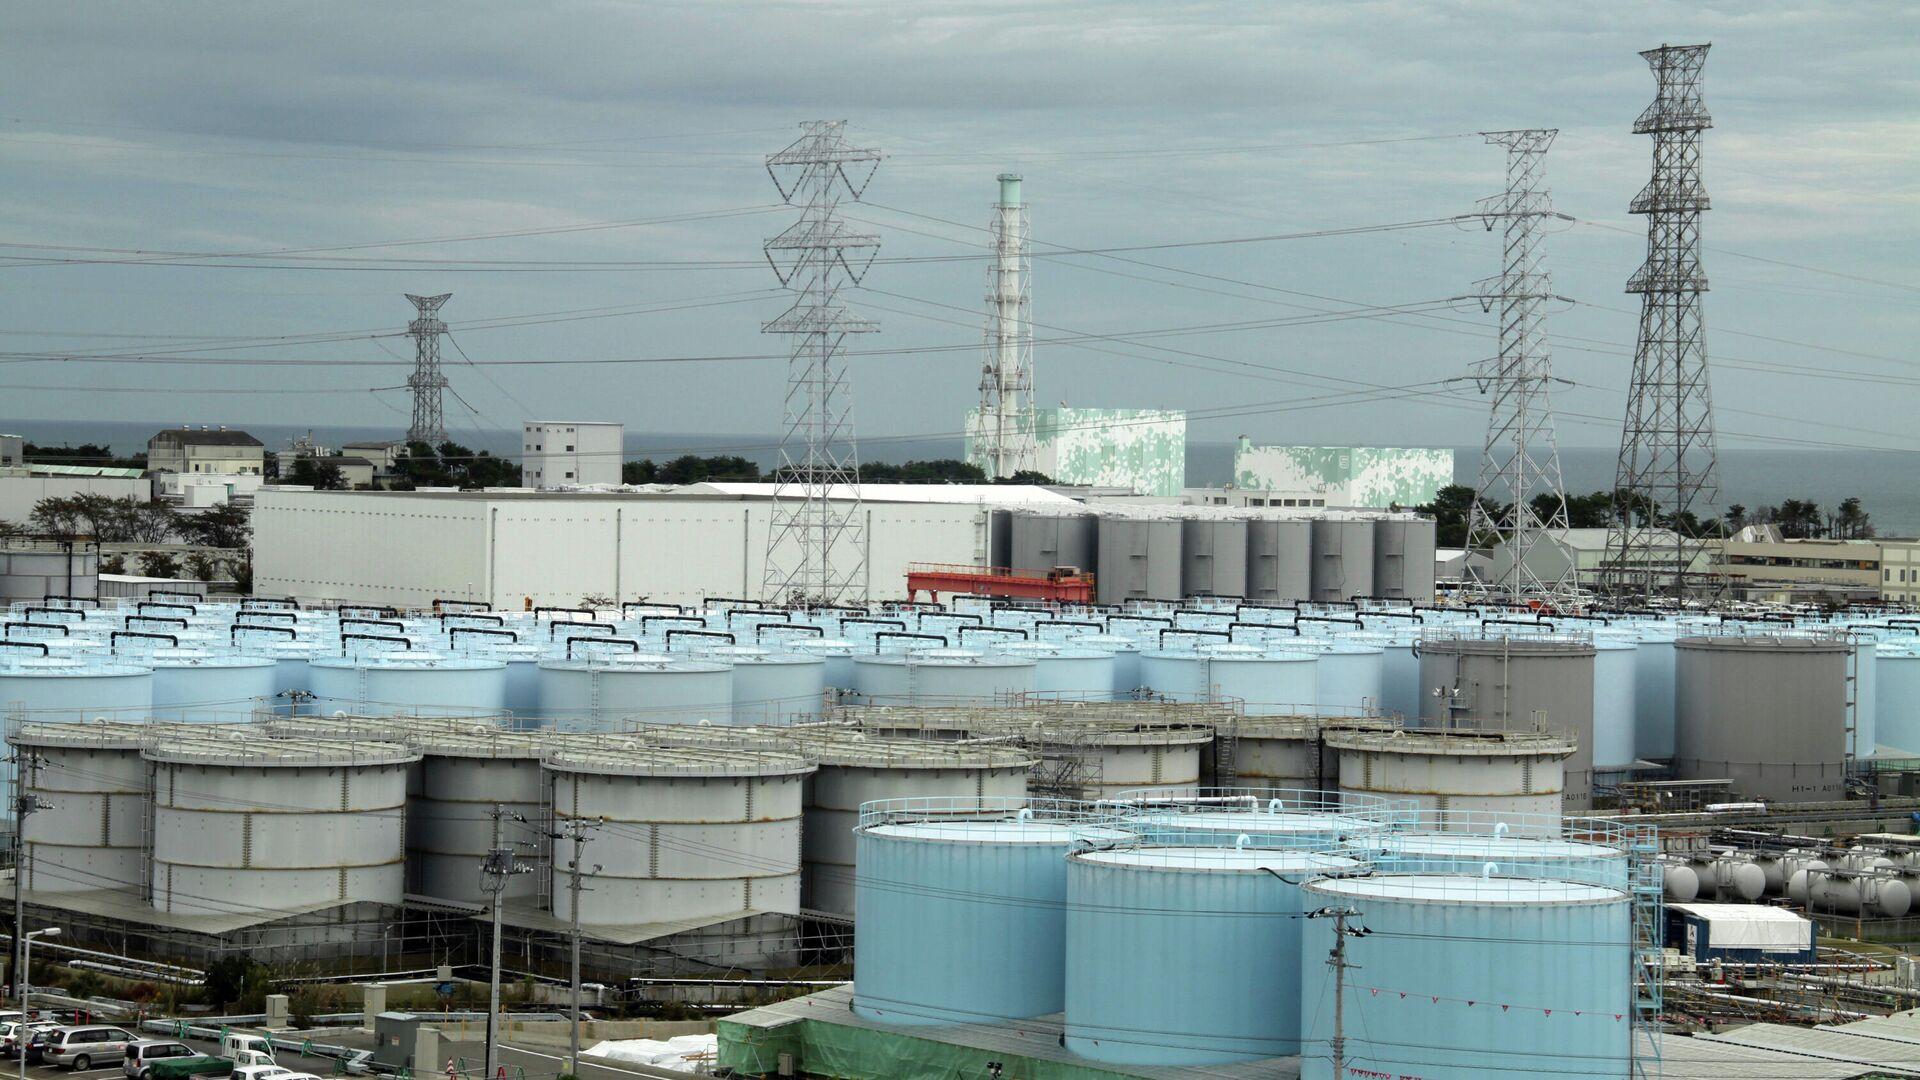 La central nuclear de Fukushima, en Japón - Sputnik Mundo, 1920, 22.02.2021